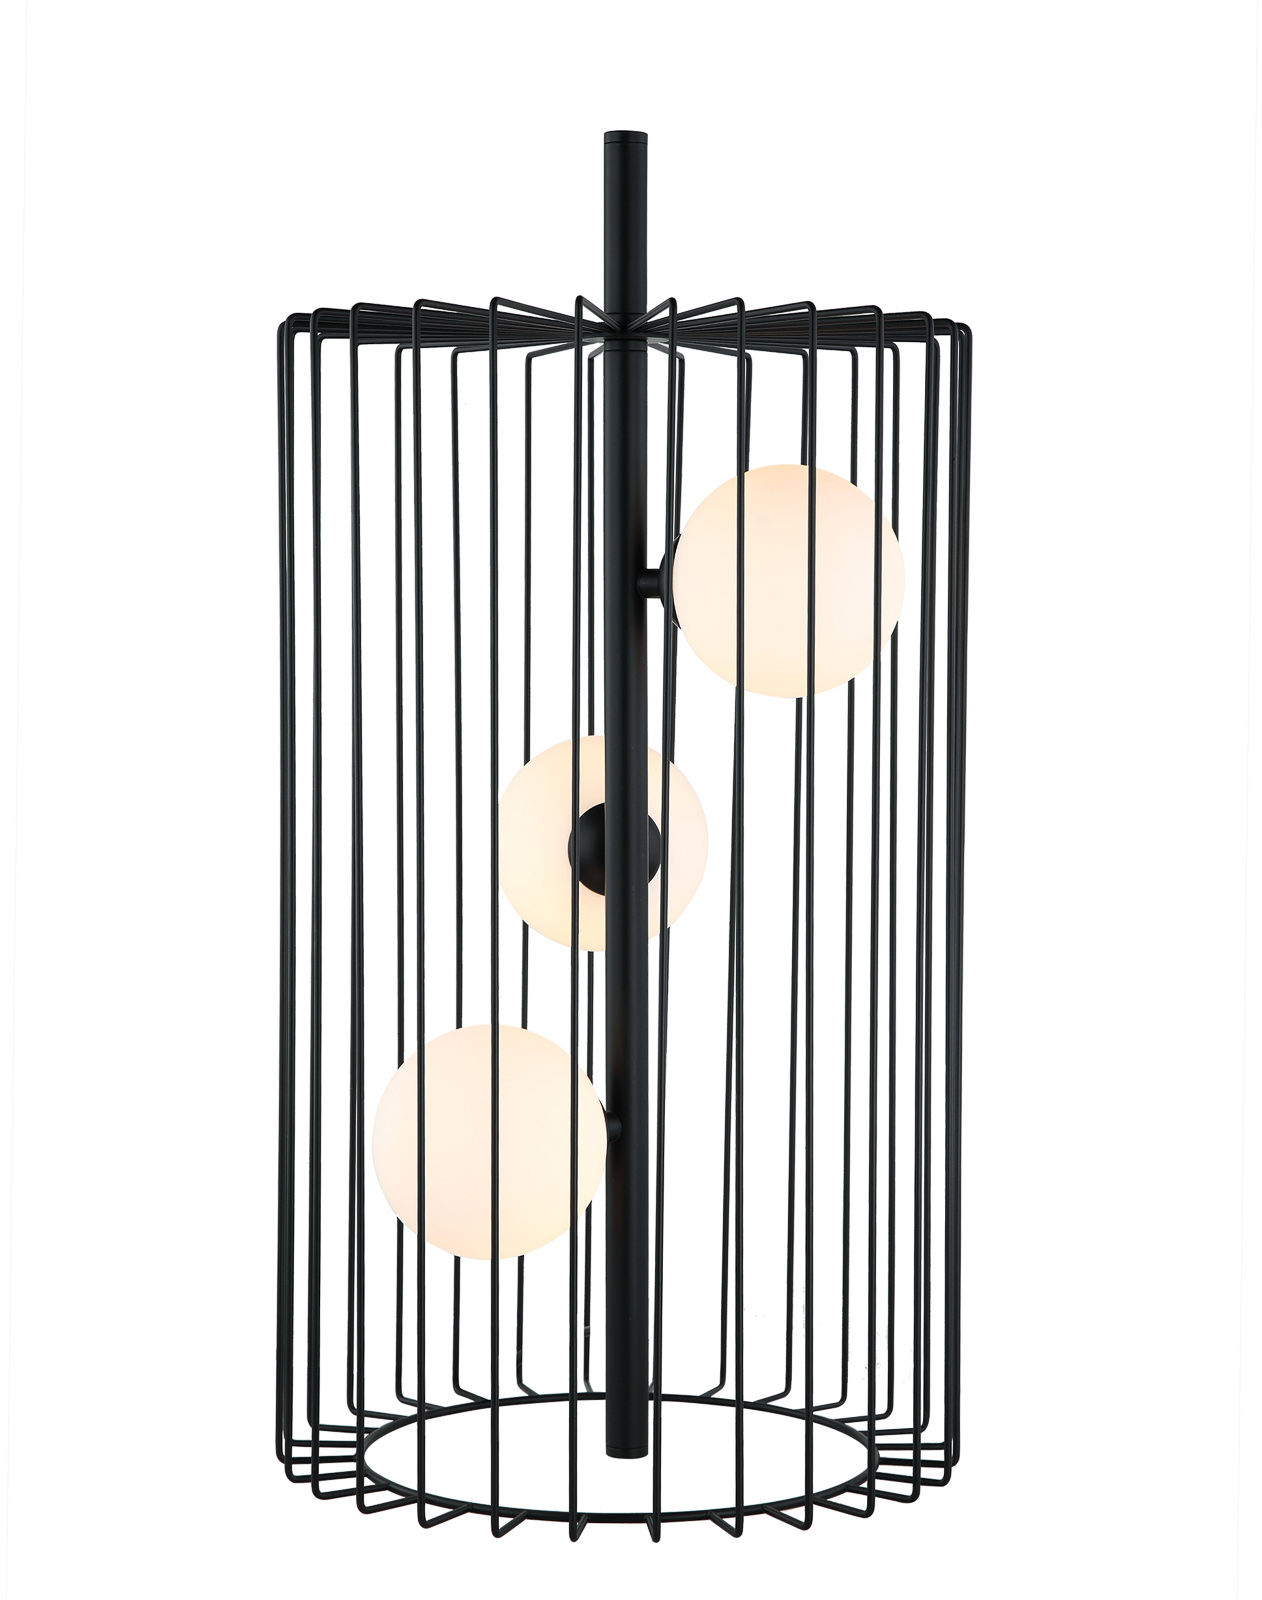 Italux lampa stołowa Hayden MTM-3935/3 BK czarna druciana szklane klosze 31cm